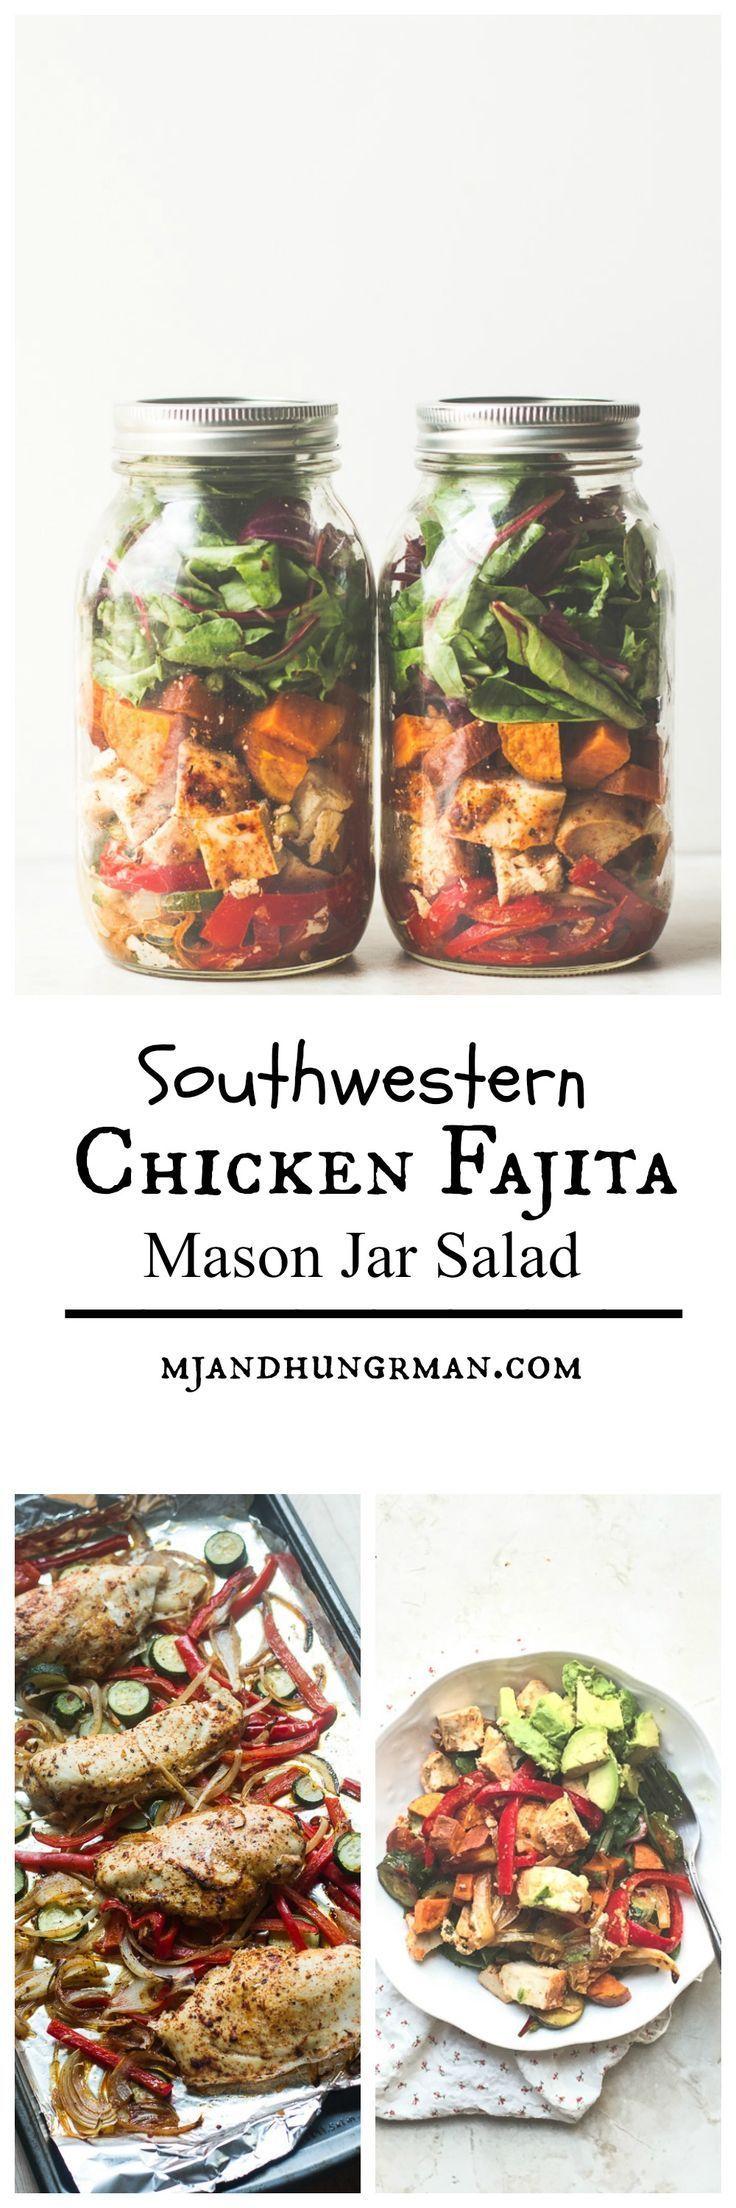 Southwestern Chicken Fajita mason Jar Salad - 25+ things to eat in a mason jar - NoBiggie.net